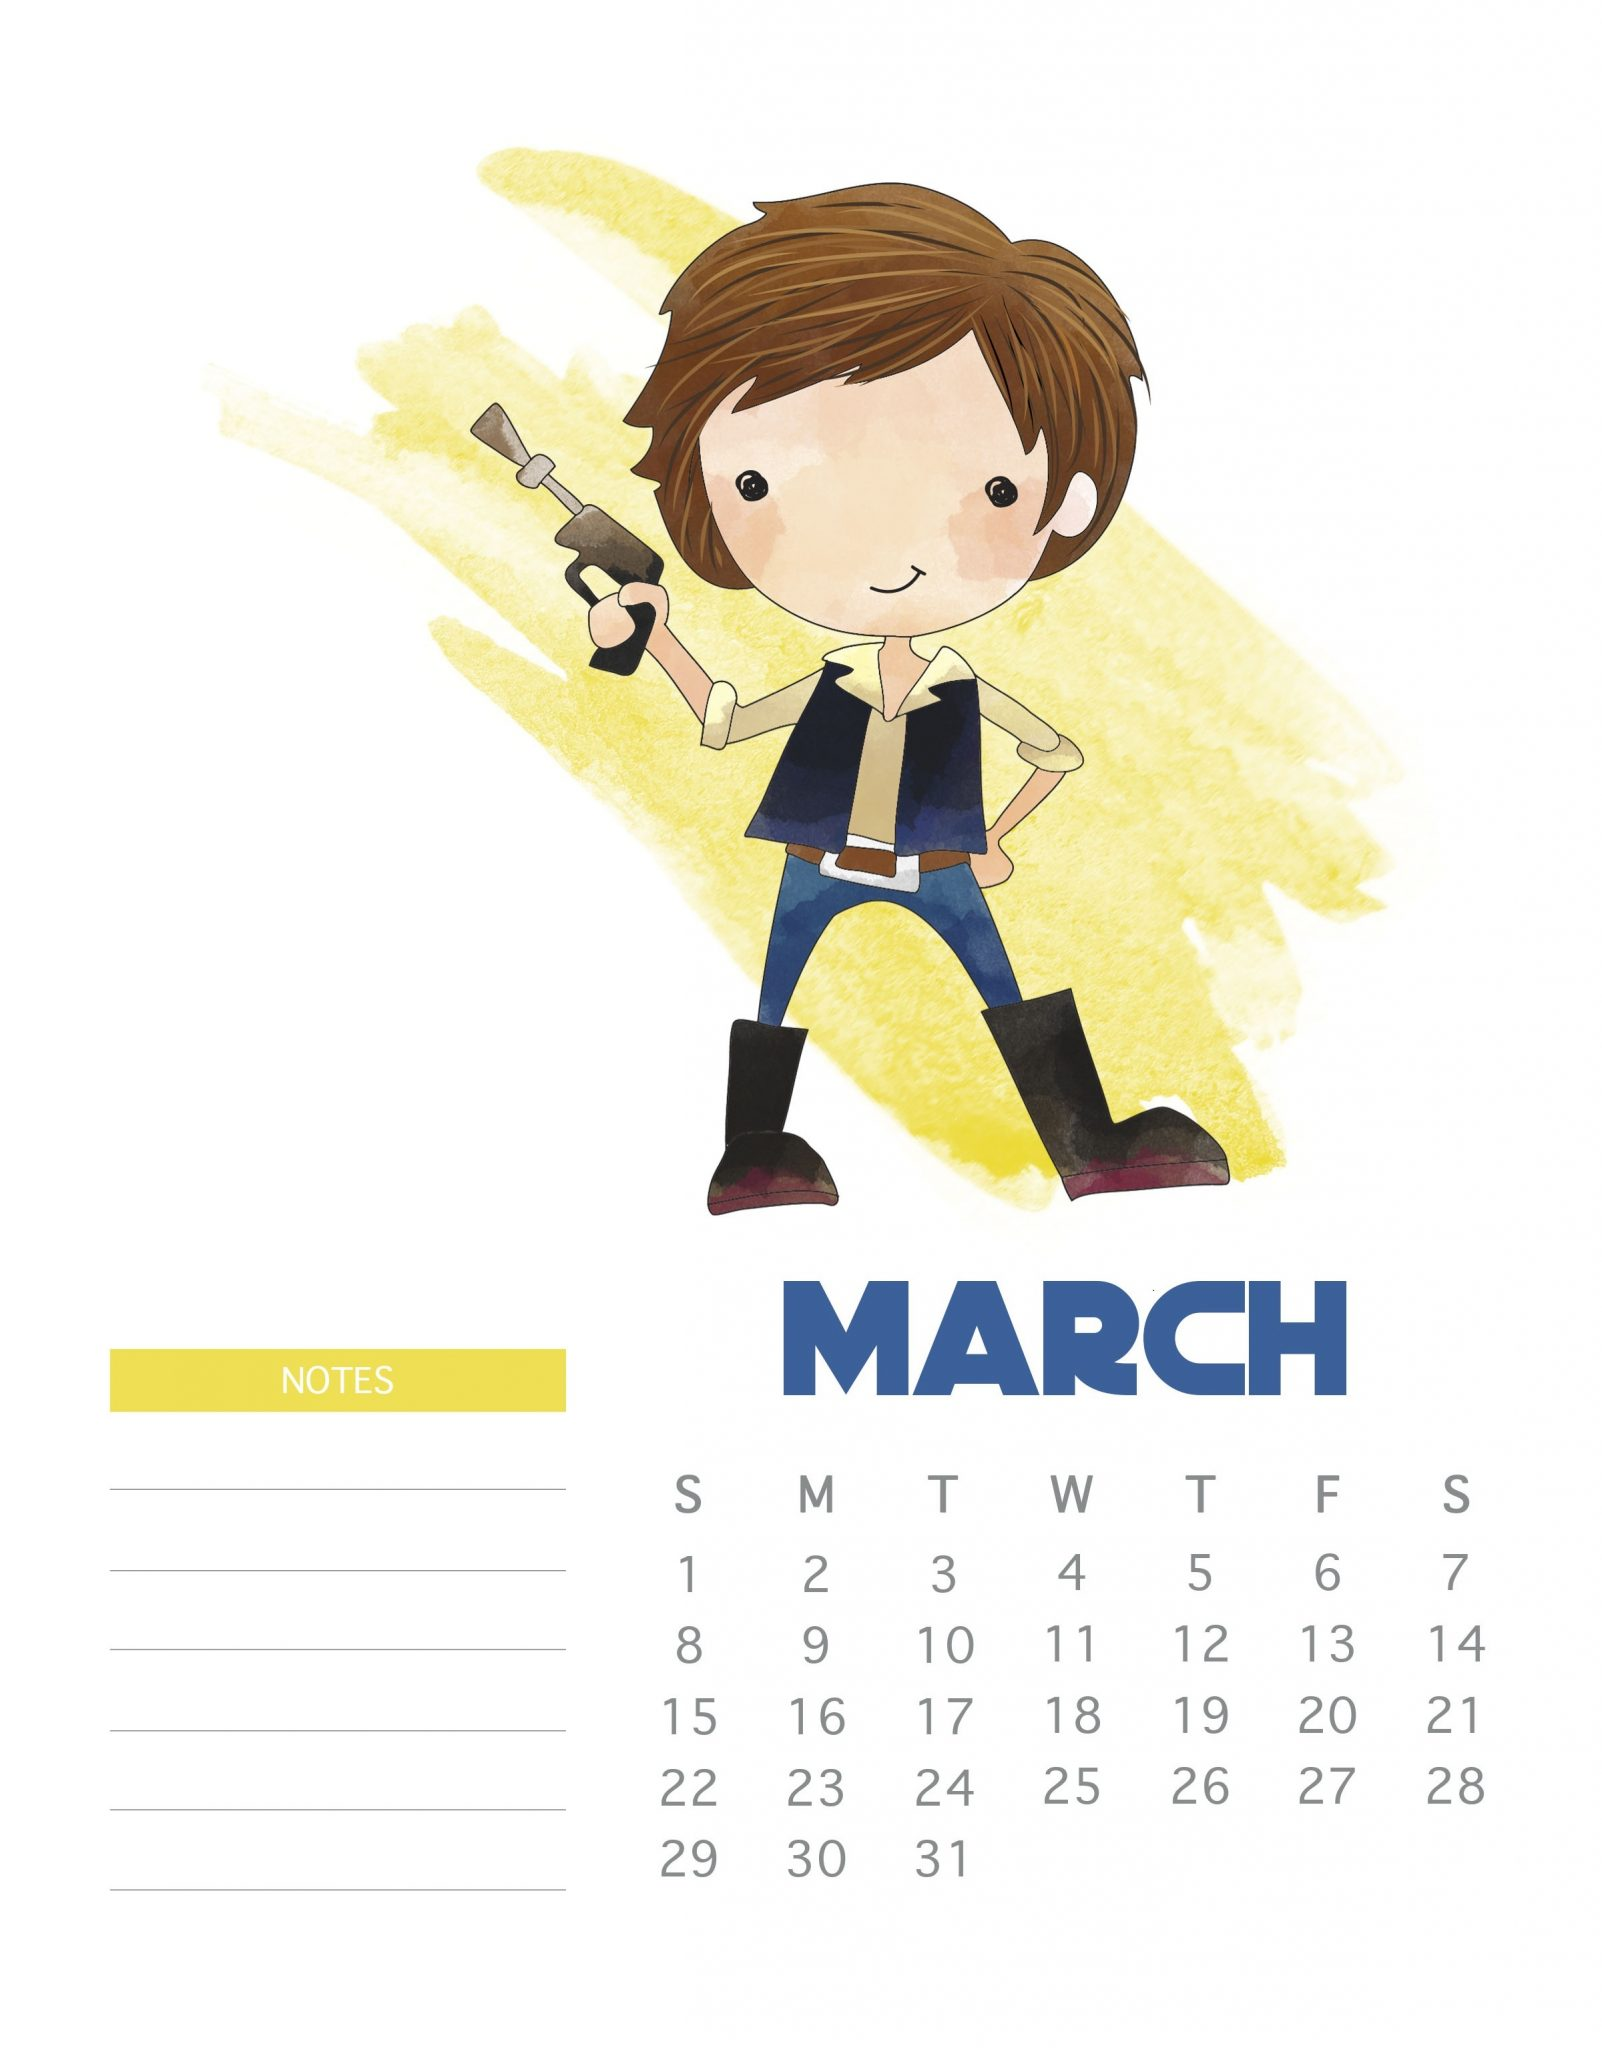 Star Wars March 2020 Calendar